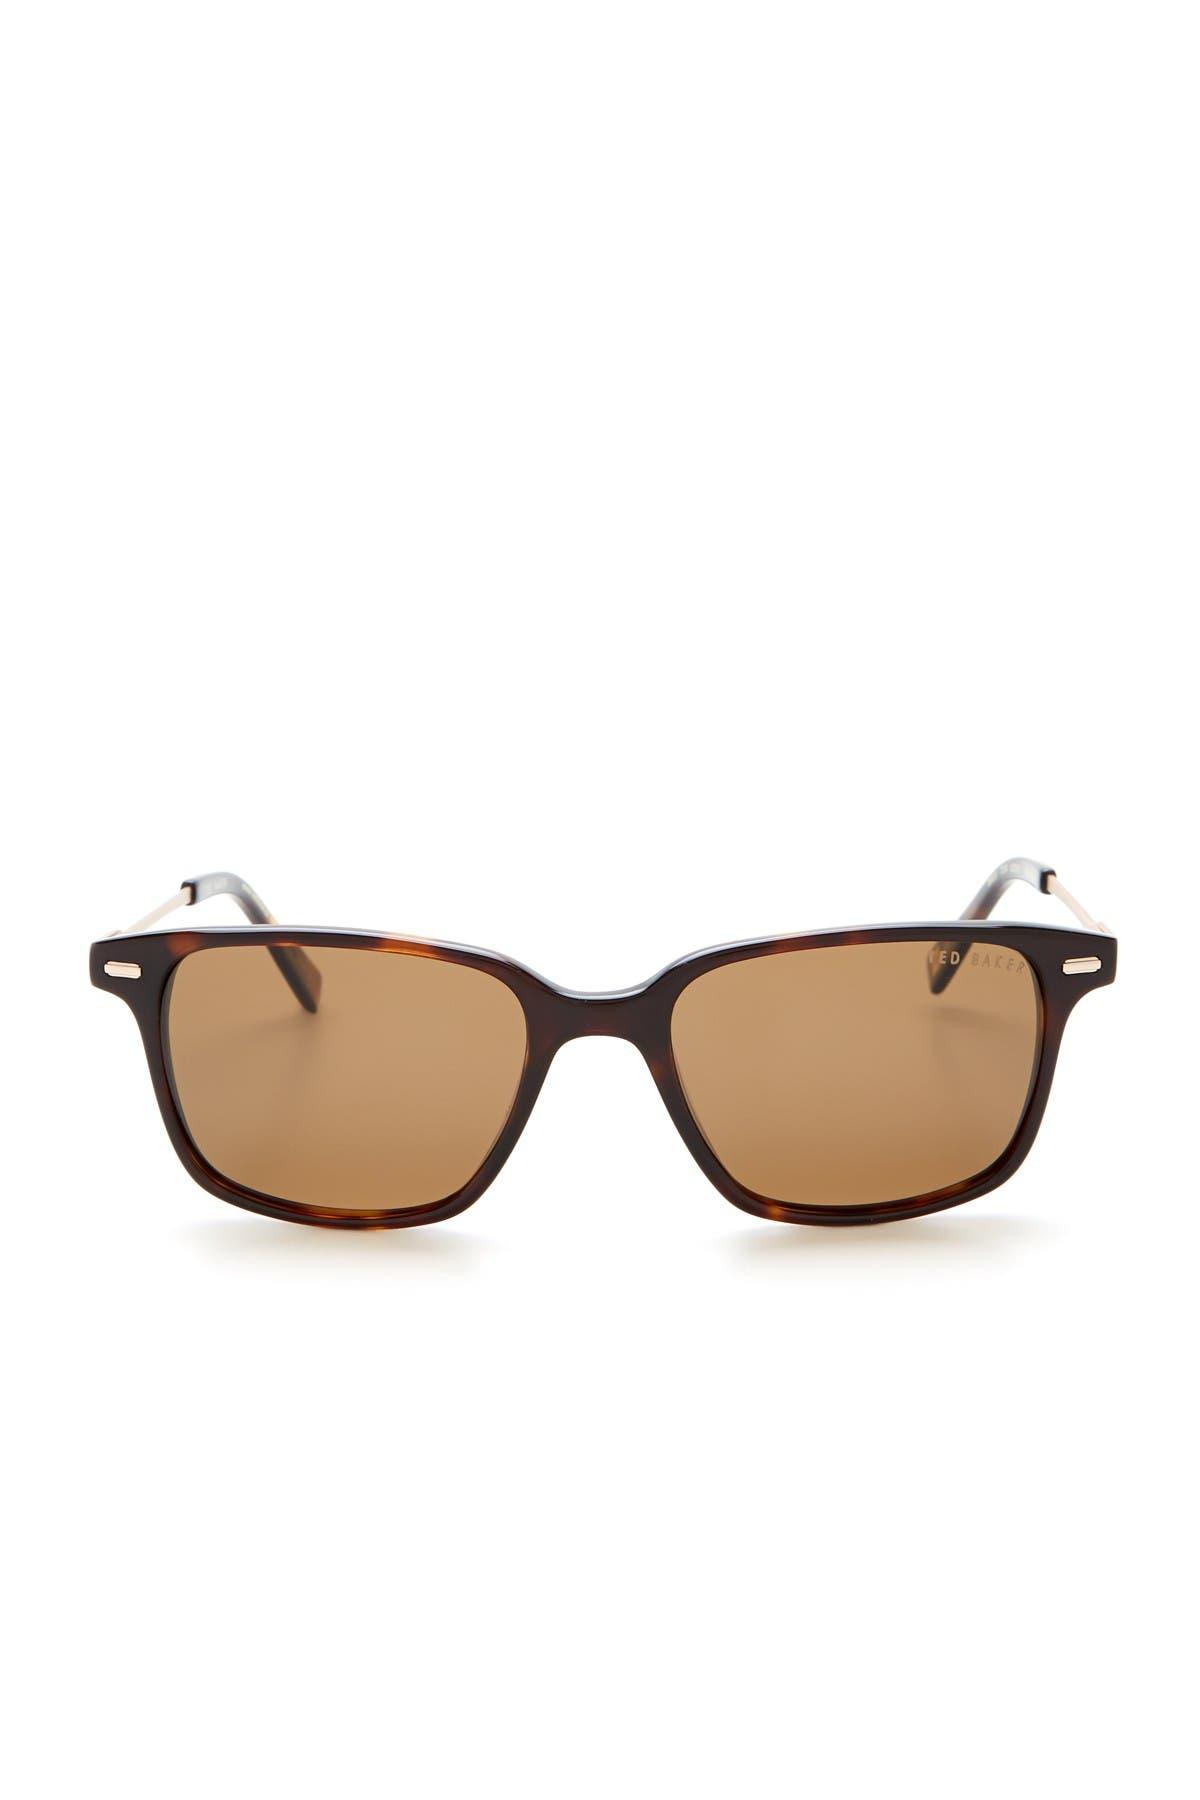 Image of Ted Baker London 52mm Square Polarized Plastic Frame Sunglasses